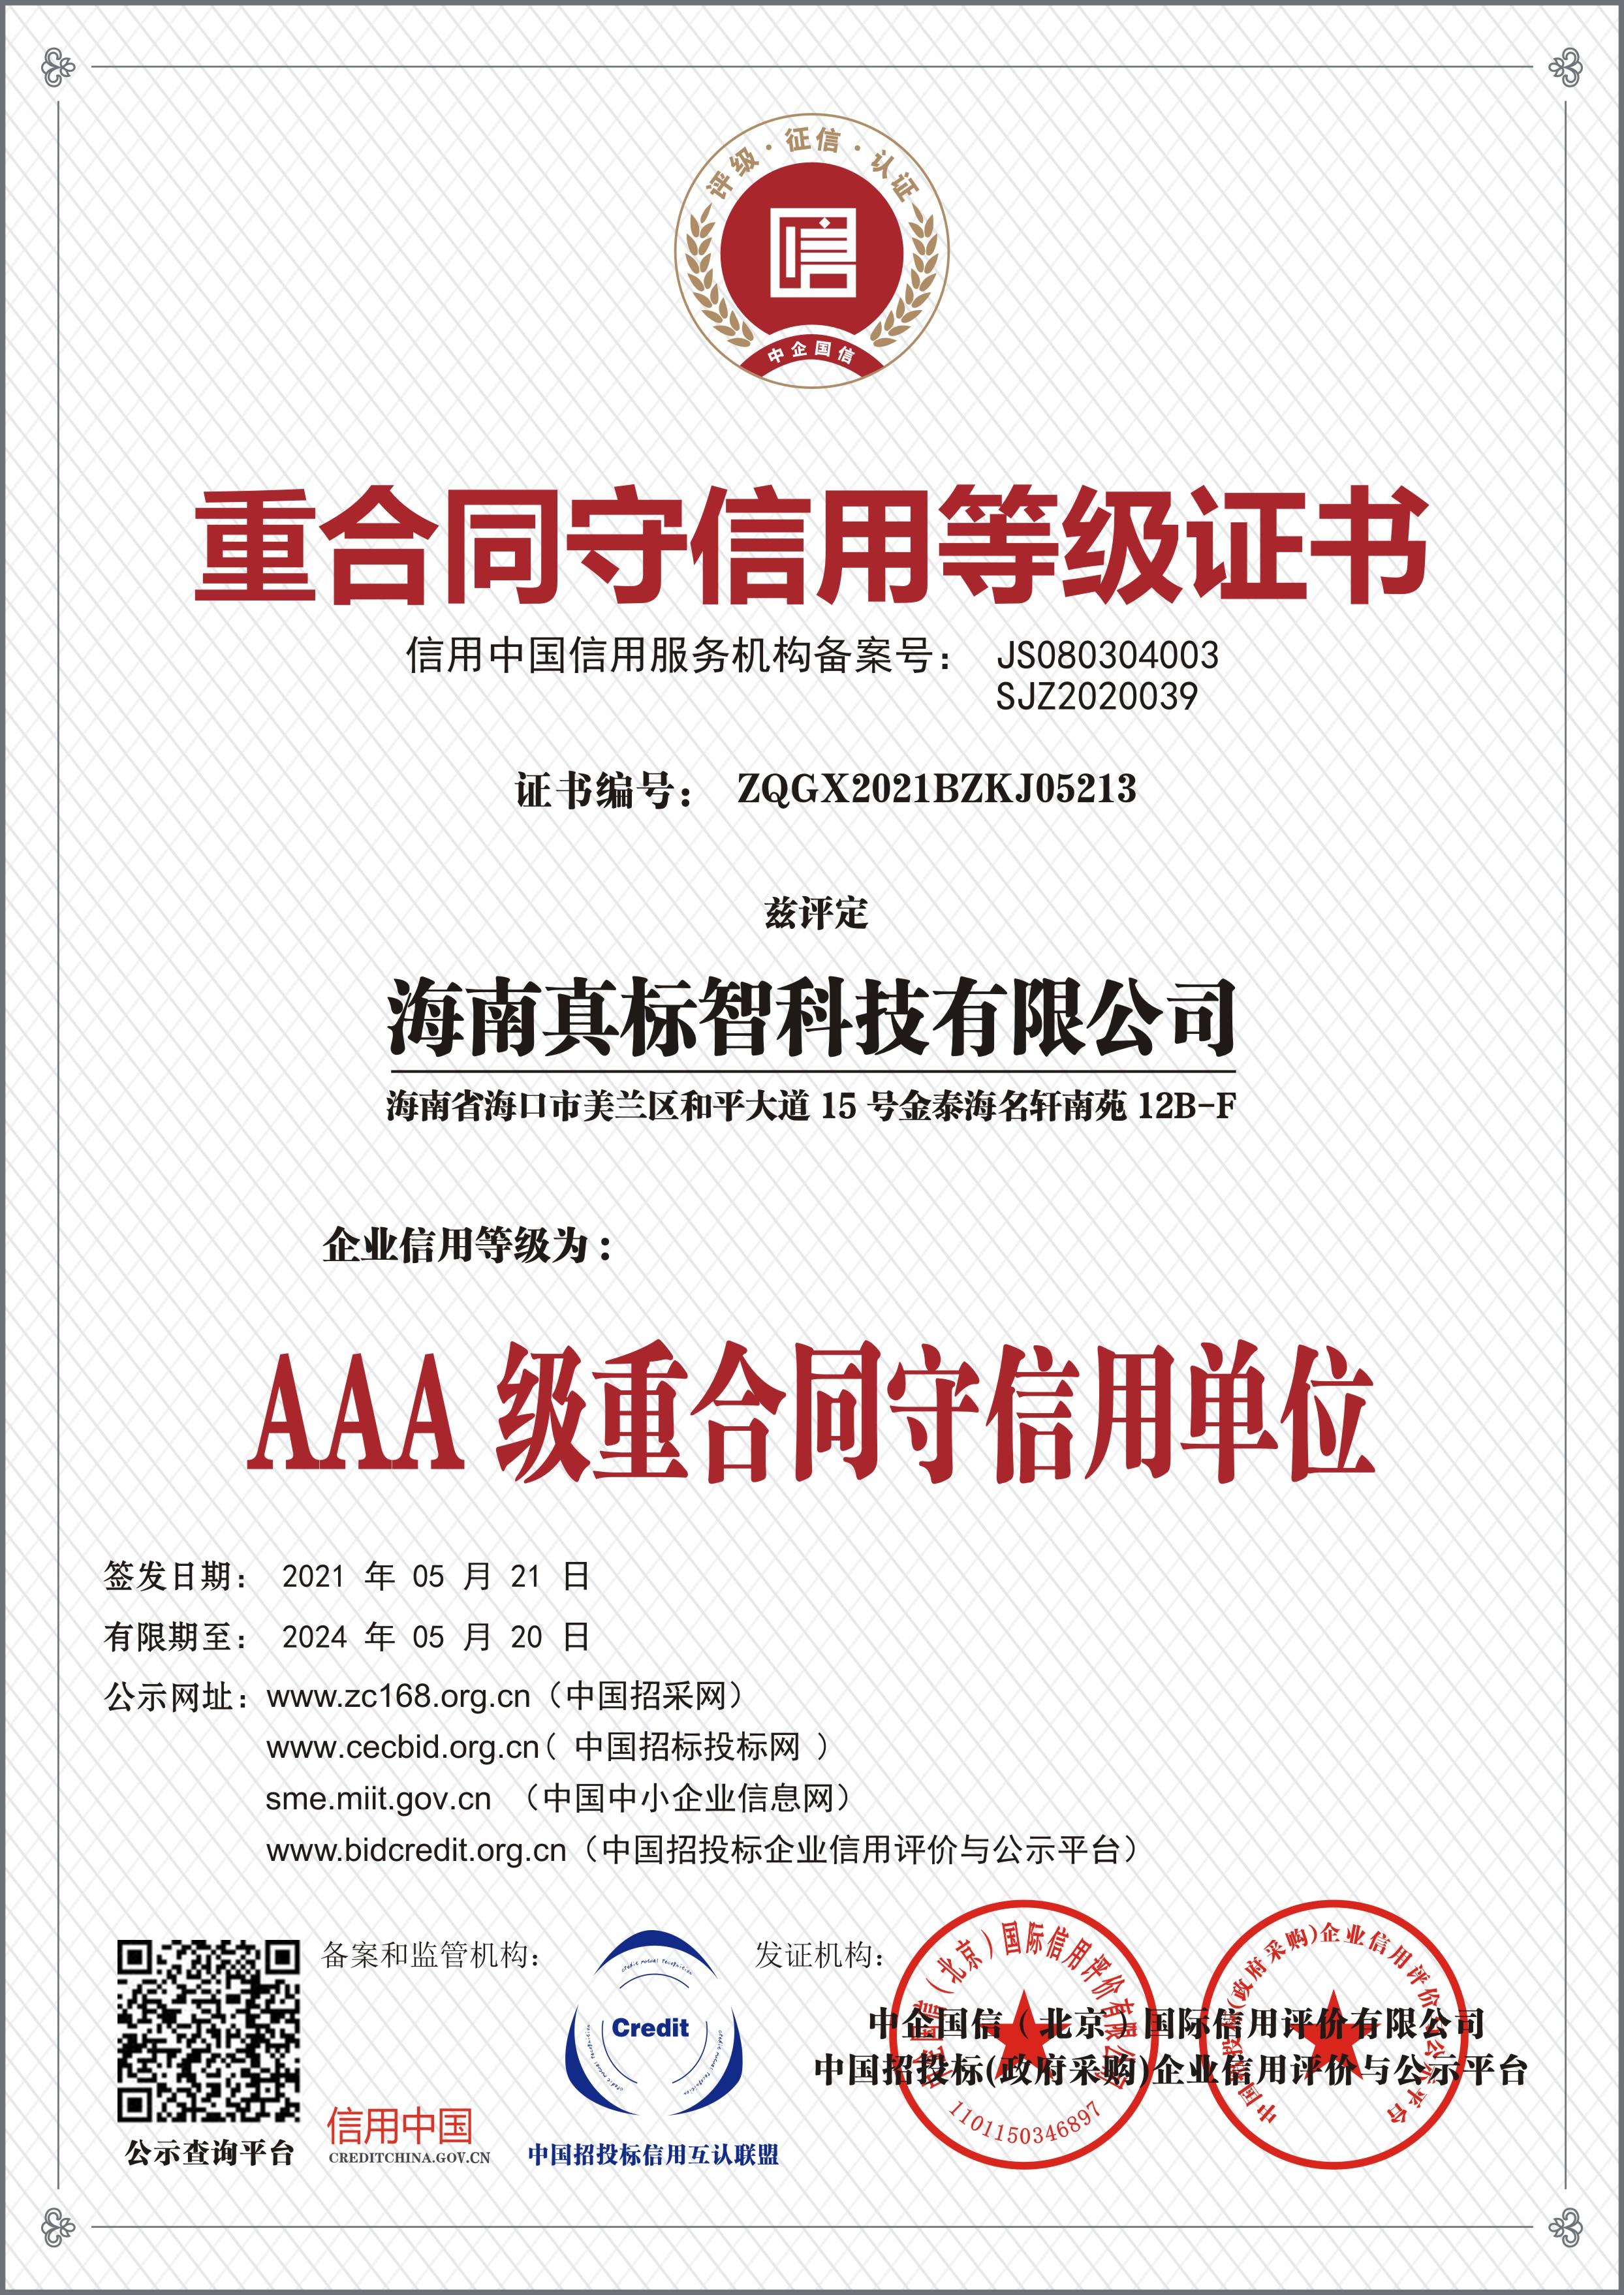 AAA重合同守信用等級證書.jpg